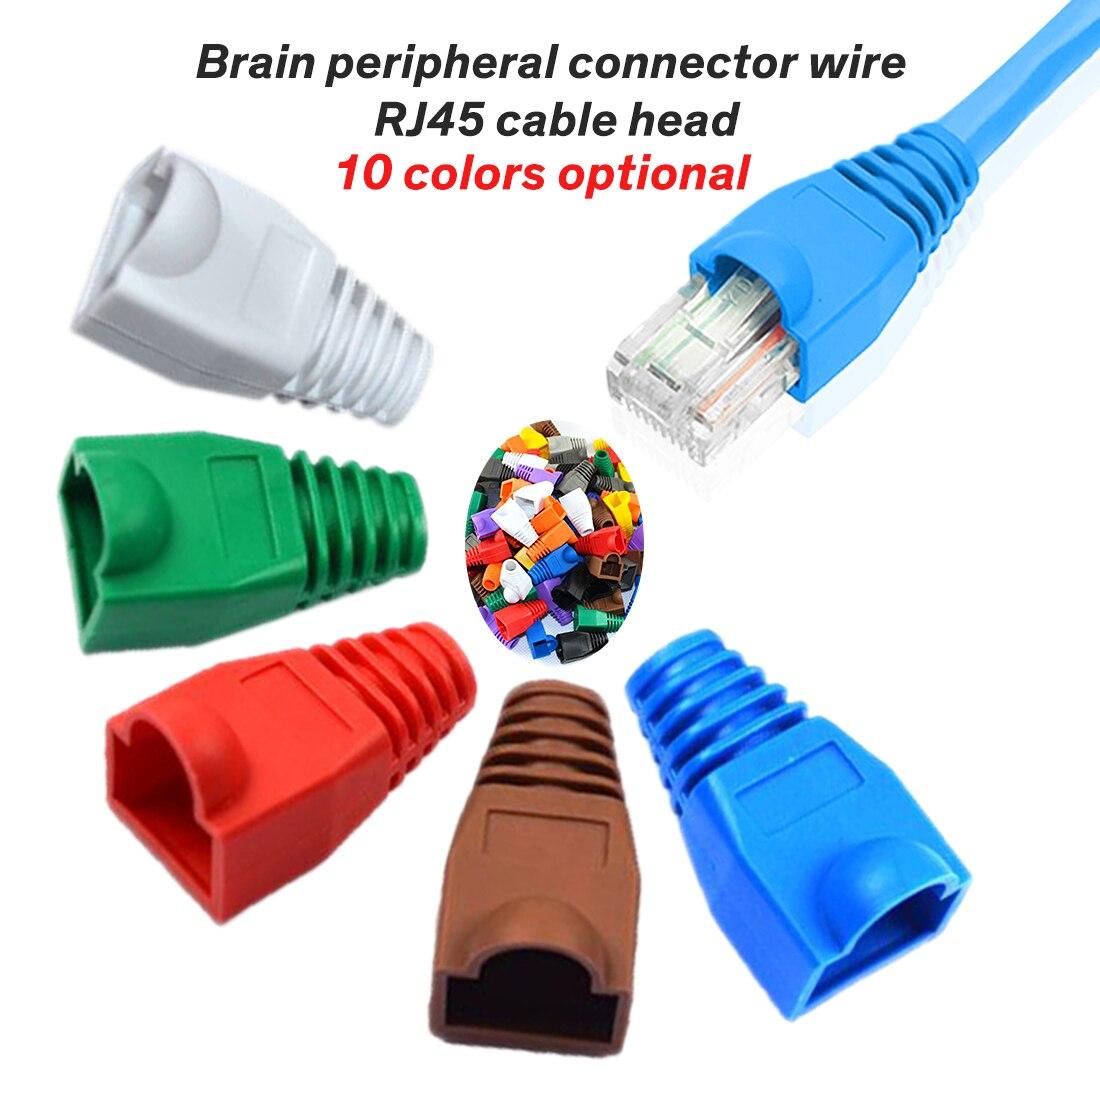 20pcs Colorful RJ-45 Adapter Cap 0.6mm For Ethernet Network Cable Connector Plugs RJ45 Cat5 CAT6 Cover Cap Socket Boots Cap Head